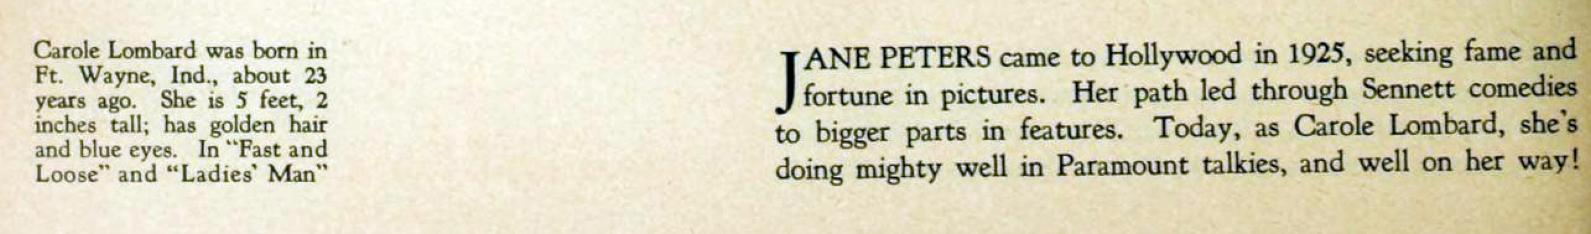 carole lombard photoplay feb 1931 caption